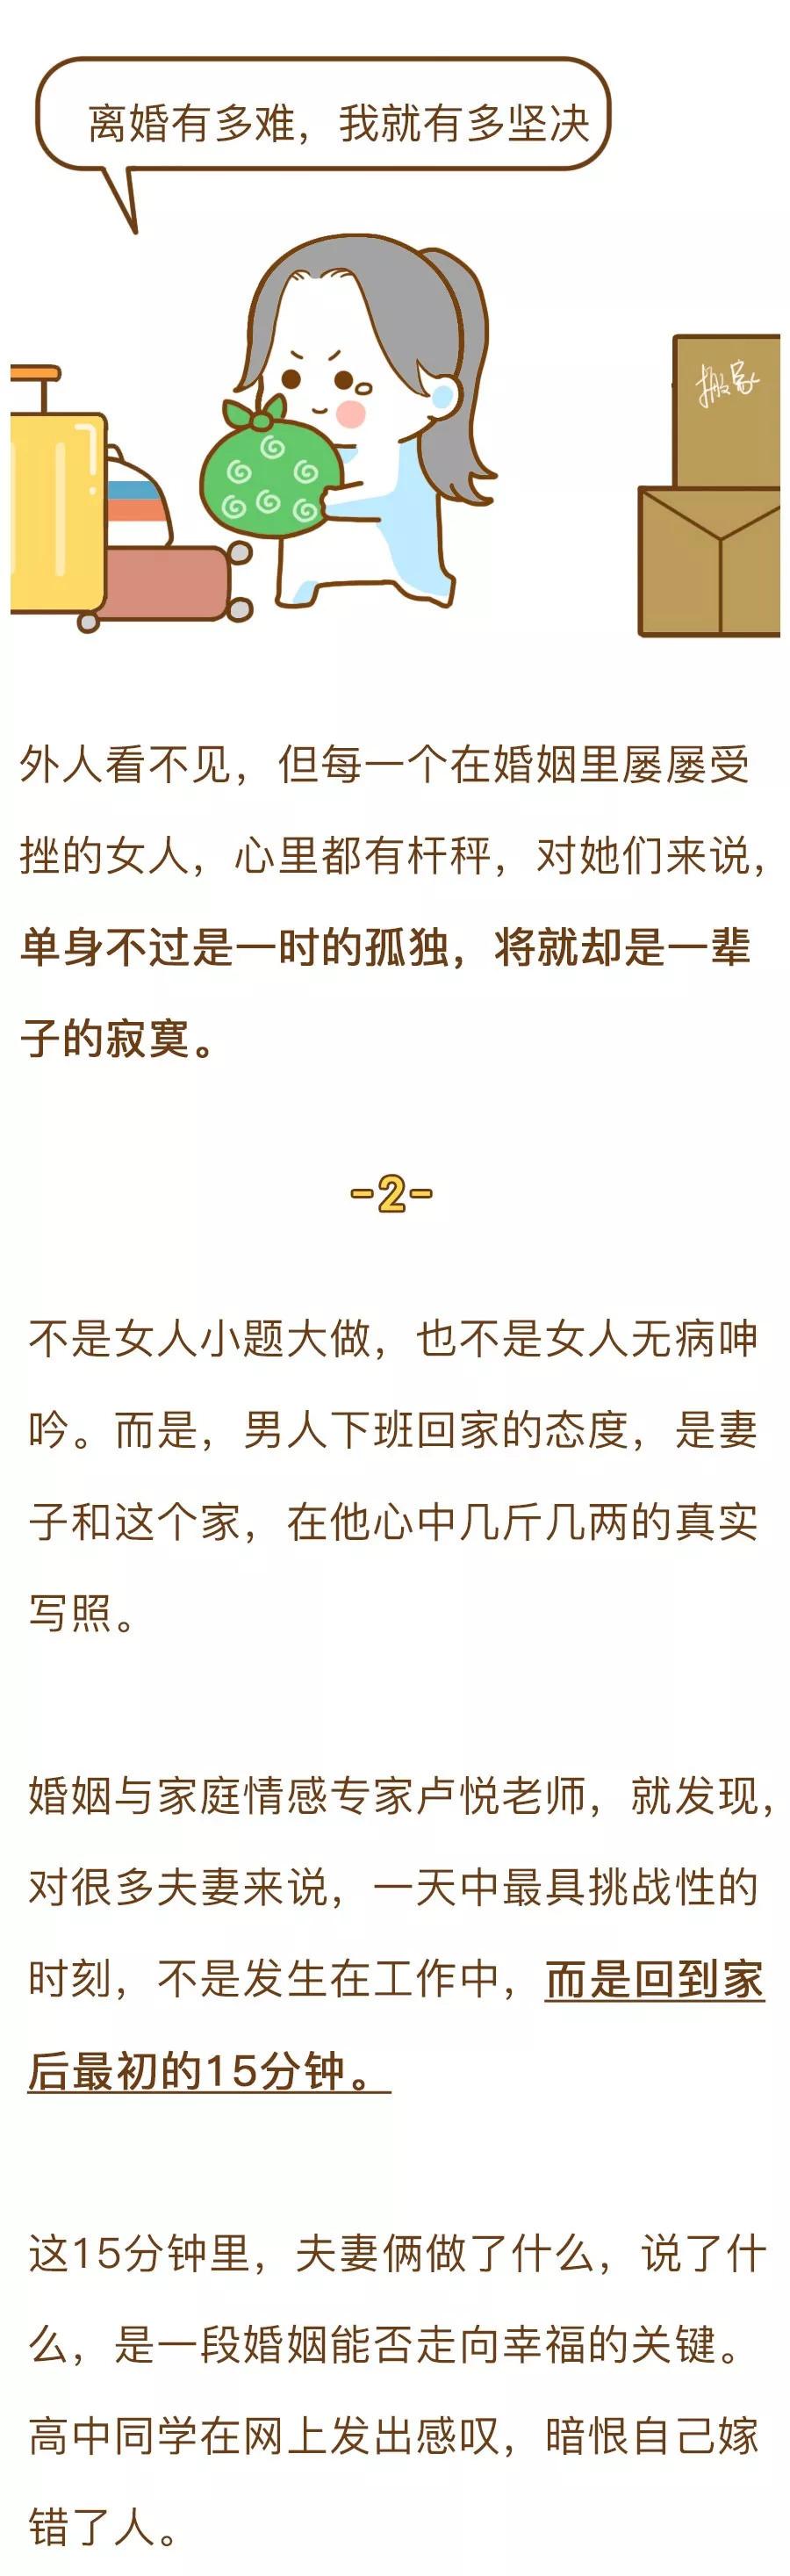 betway必威平台 17